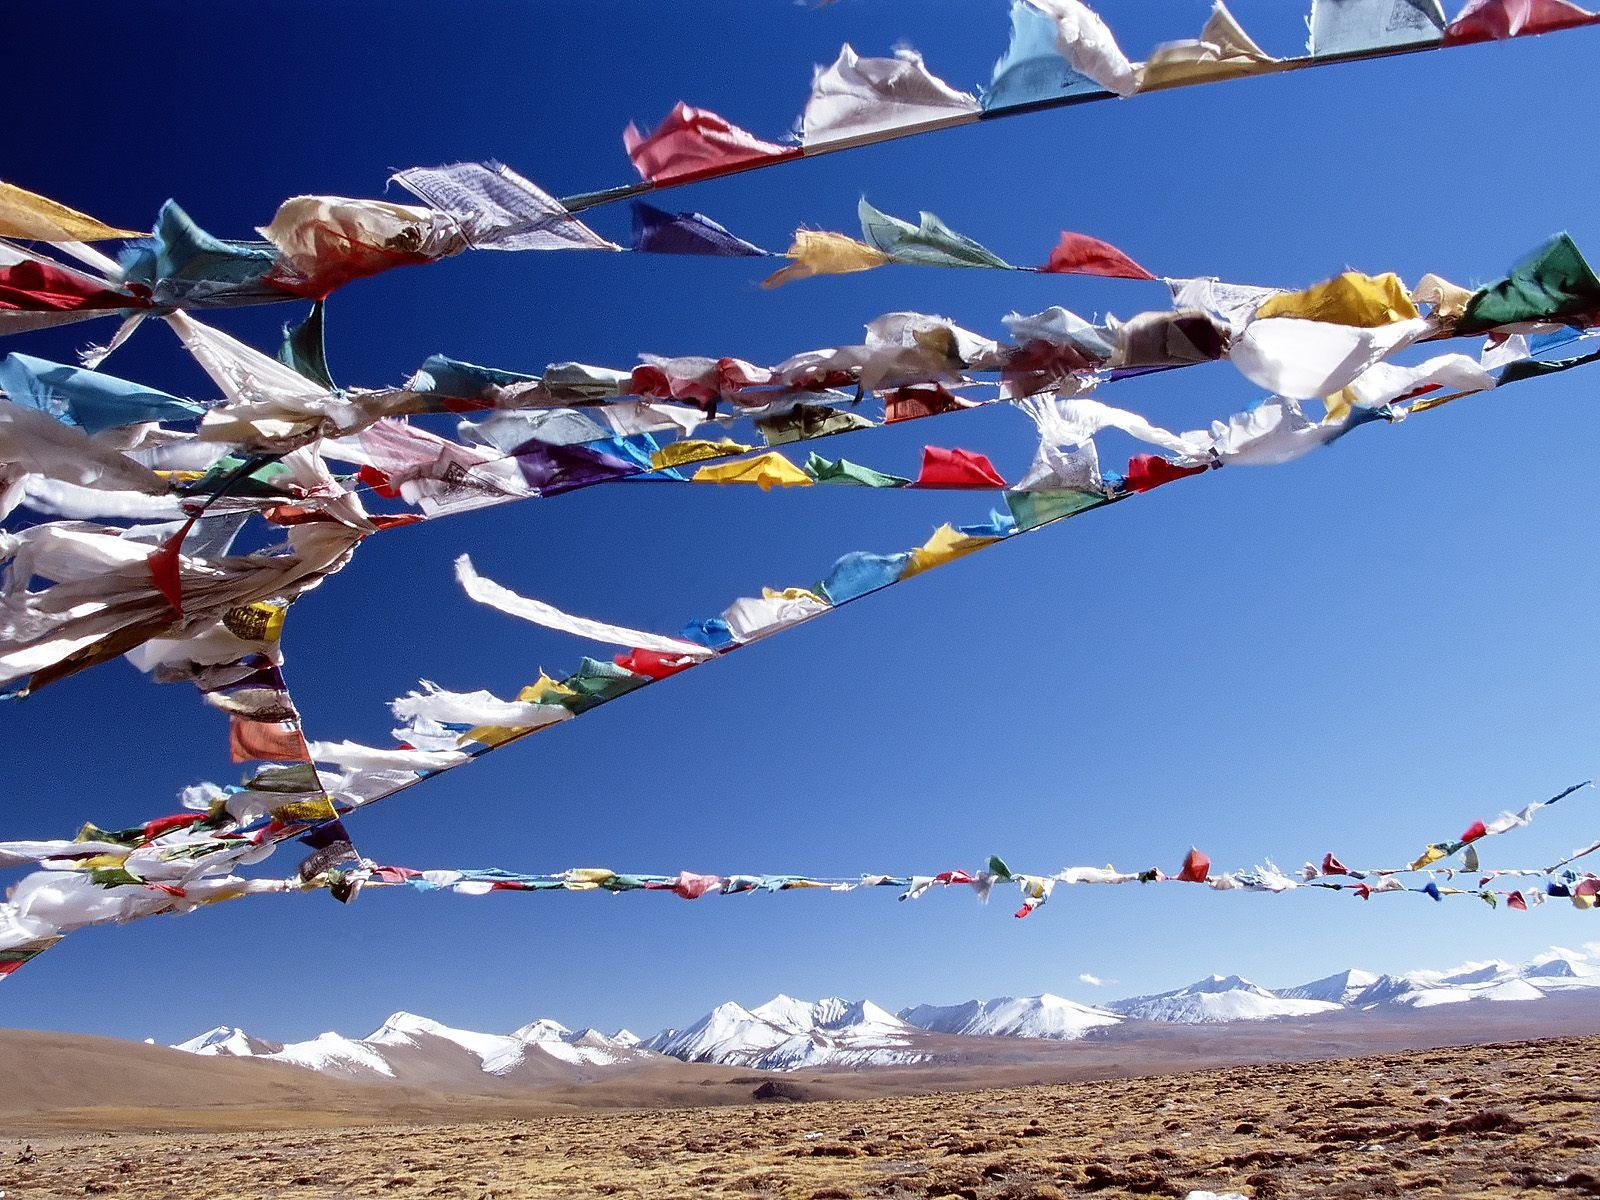 Traduction Tibétain Tatouage - Modèles de tatouages tibétains tibetan calligraphy